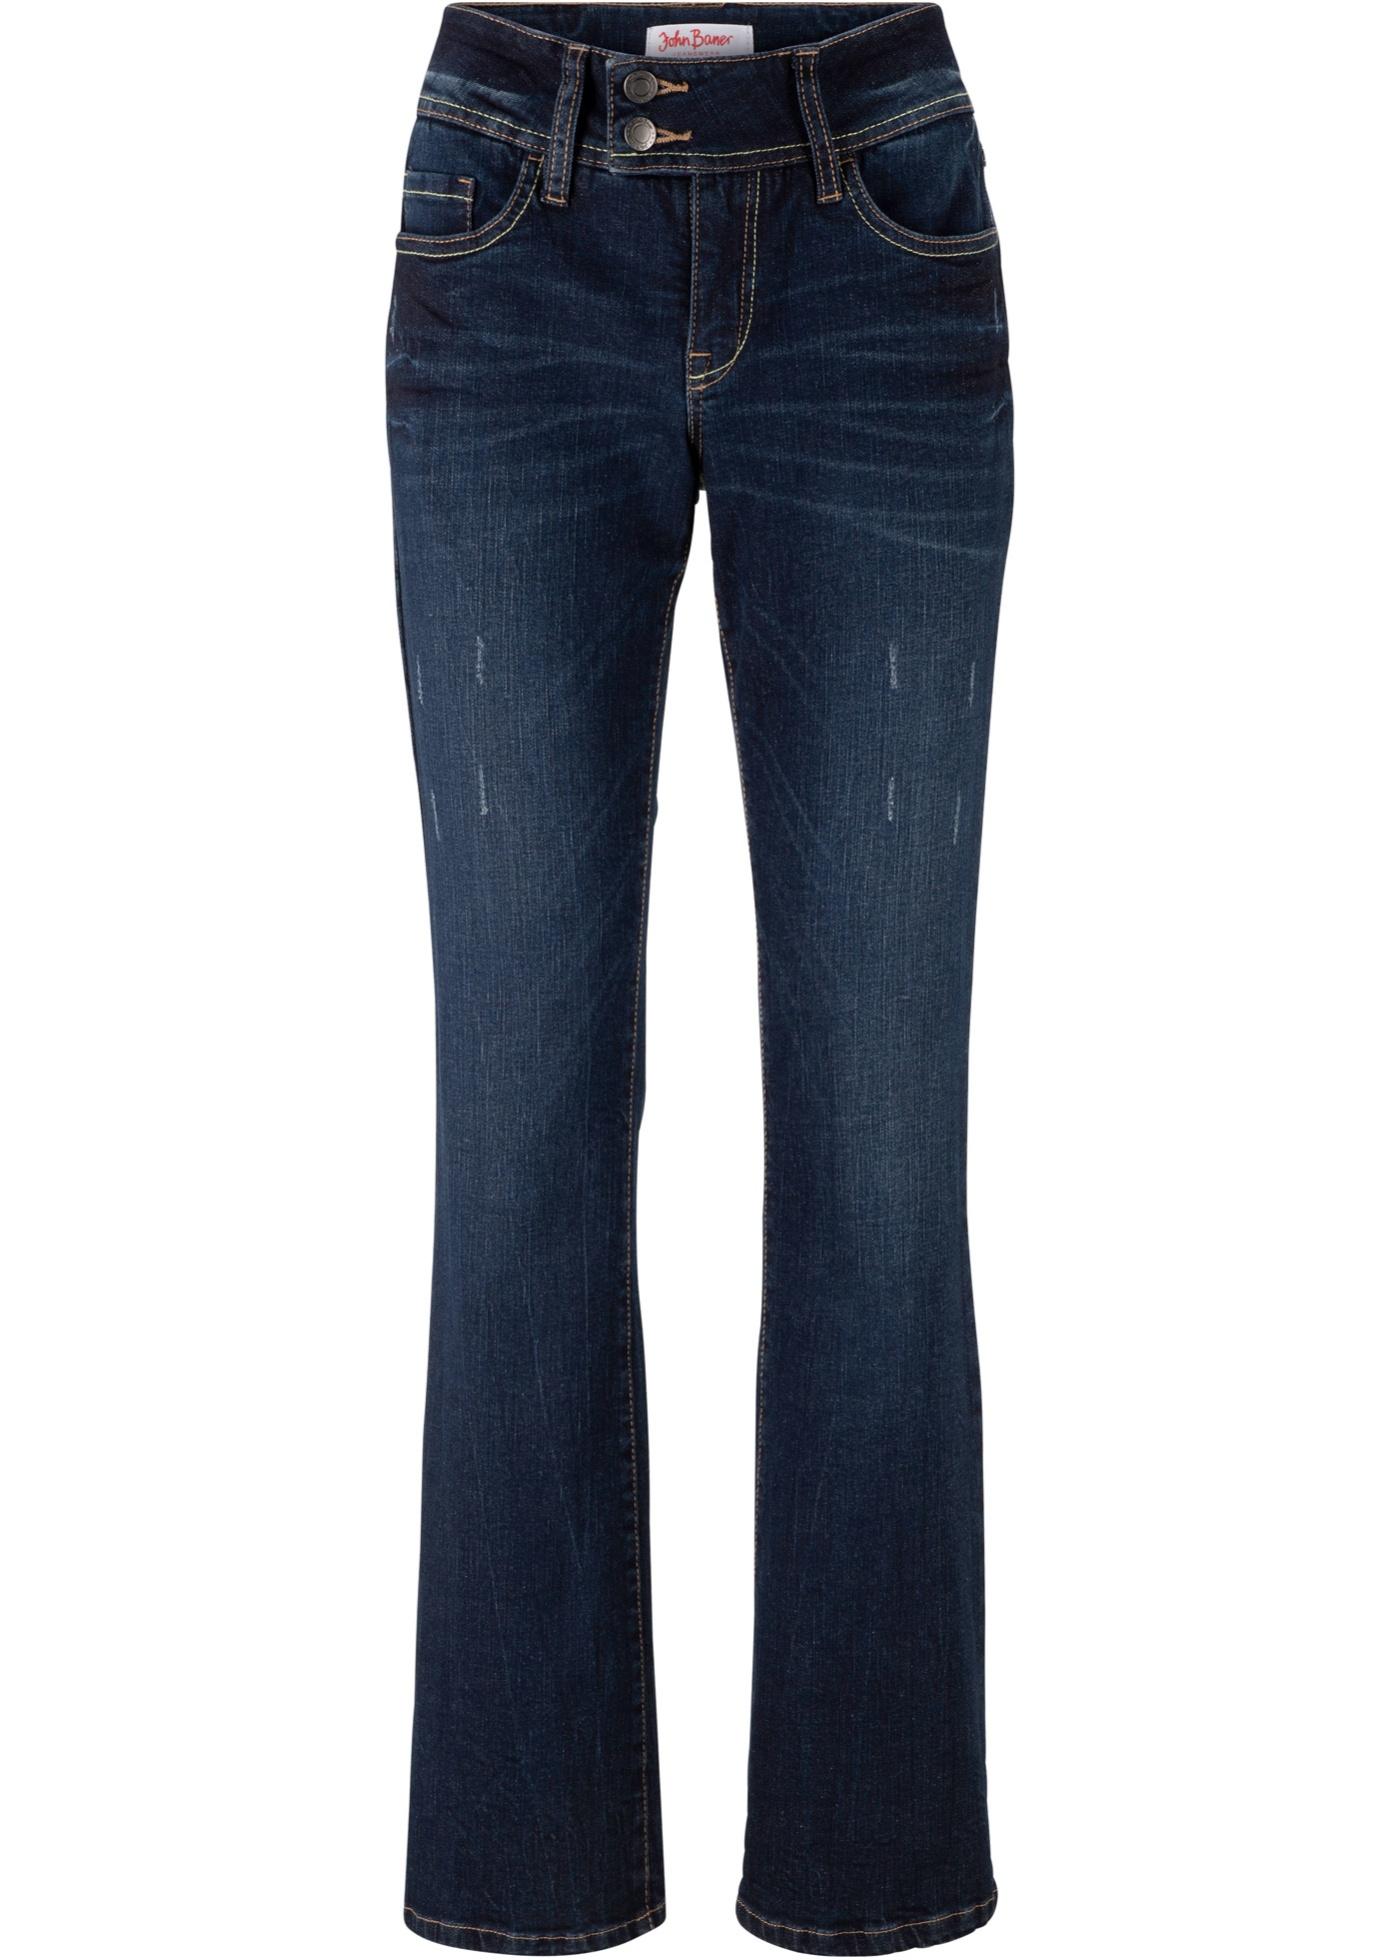 Bleu Authentique John Bootcut Pour Femme Jeanswear BonprixJean Extensible Baner Ok0XN8nwZP